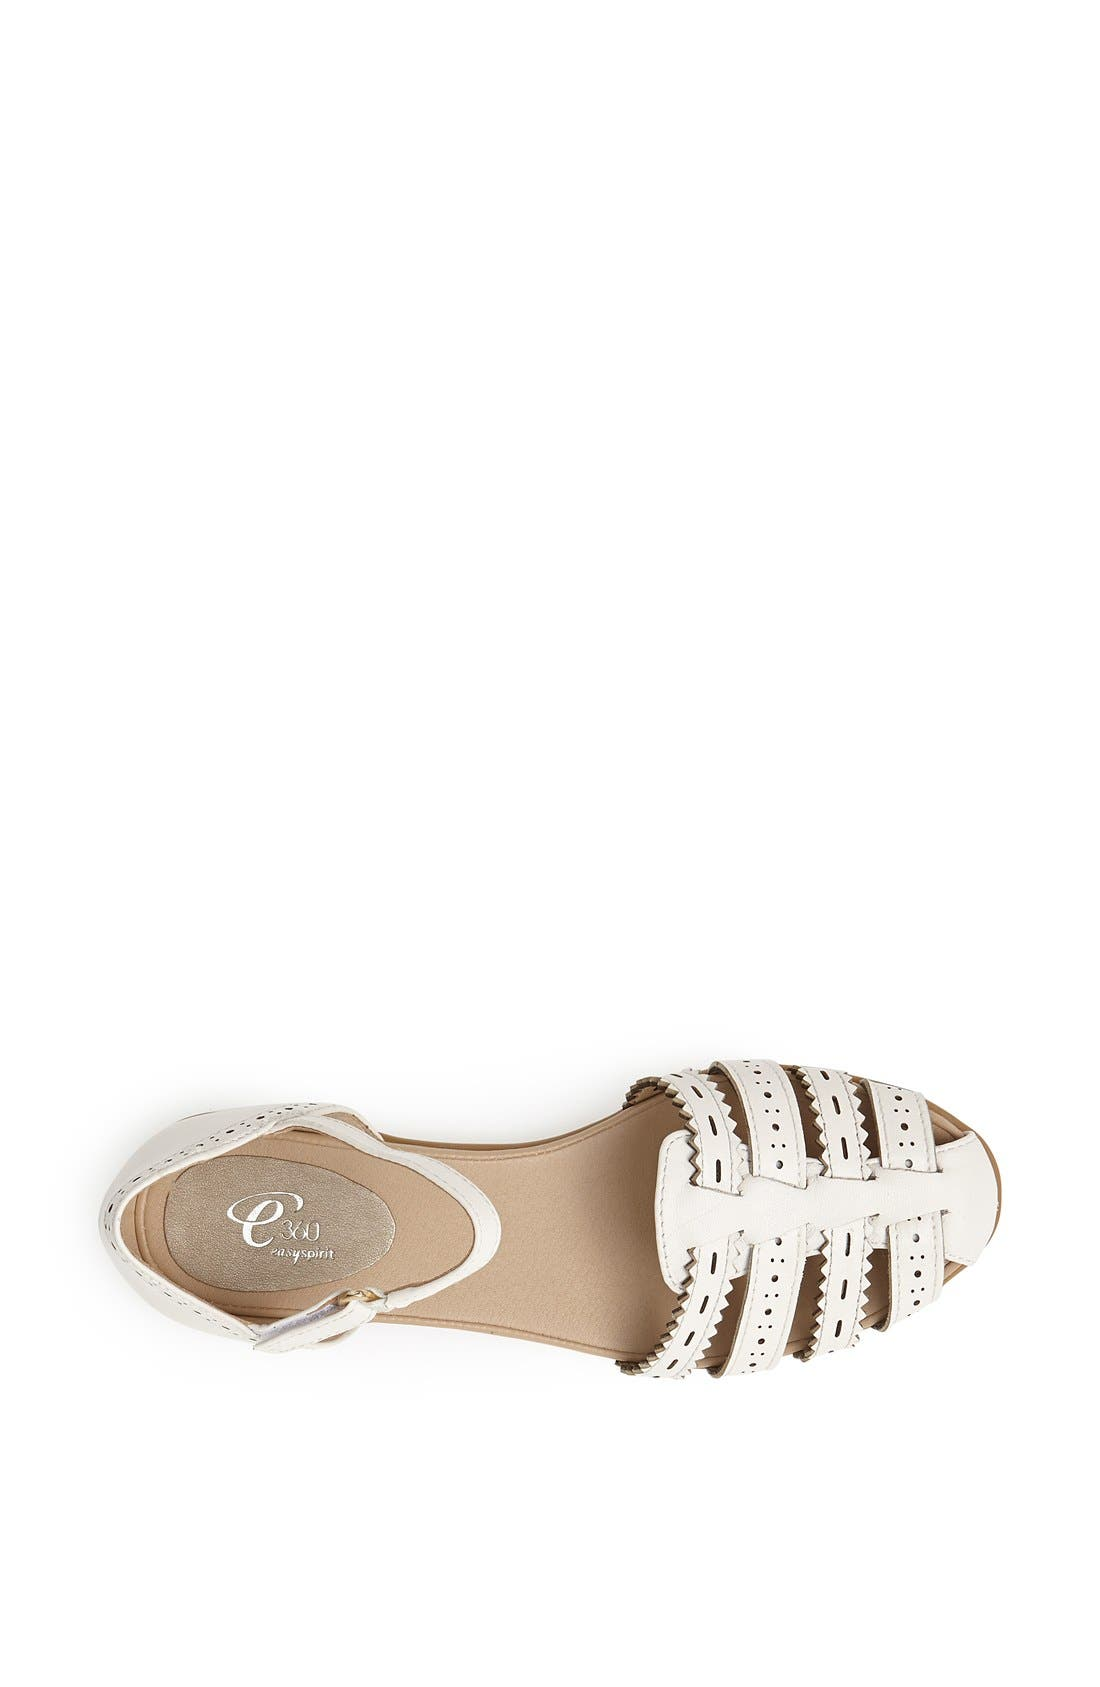 Alternate Image 3  - Easy Spirit 'e360 - Galfriday' Pinked & Perforated Leather Quarter Strap Sandal (Women)